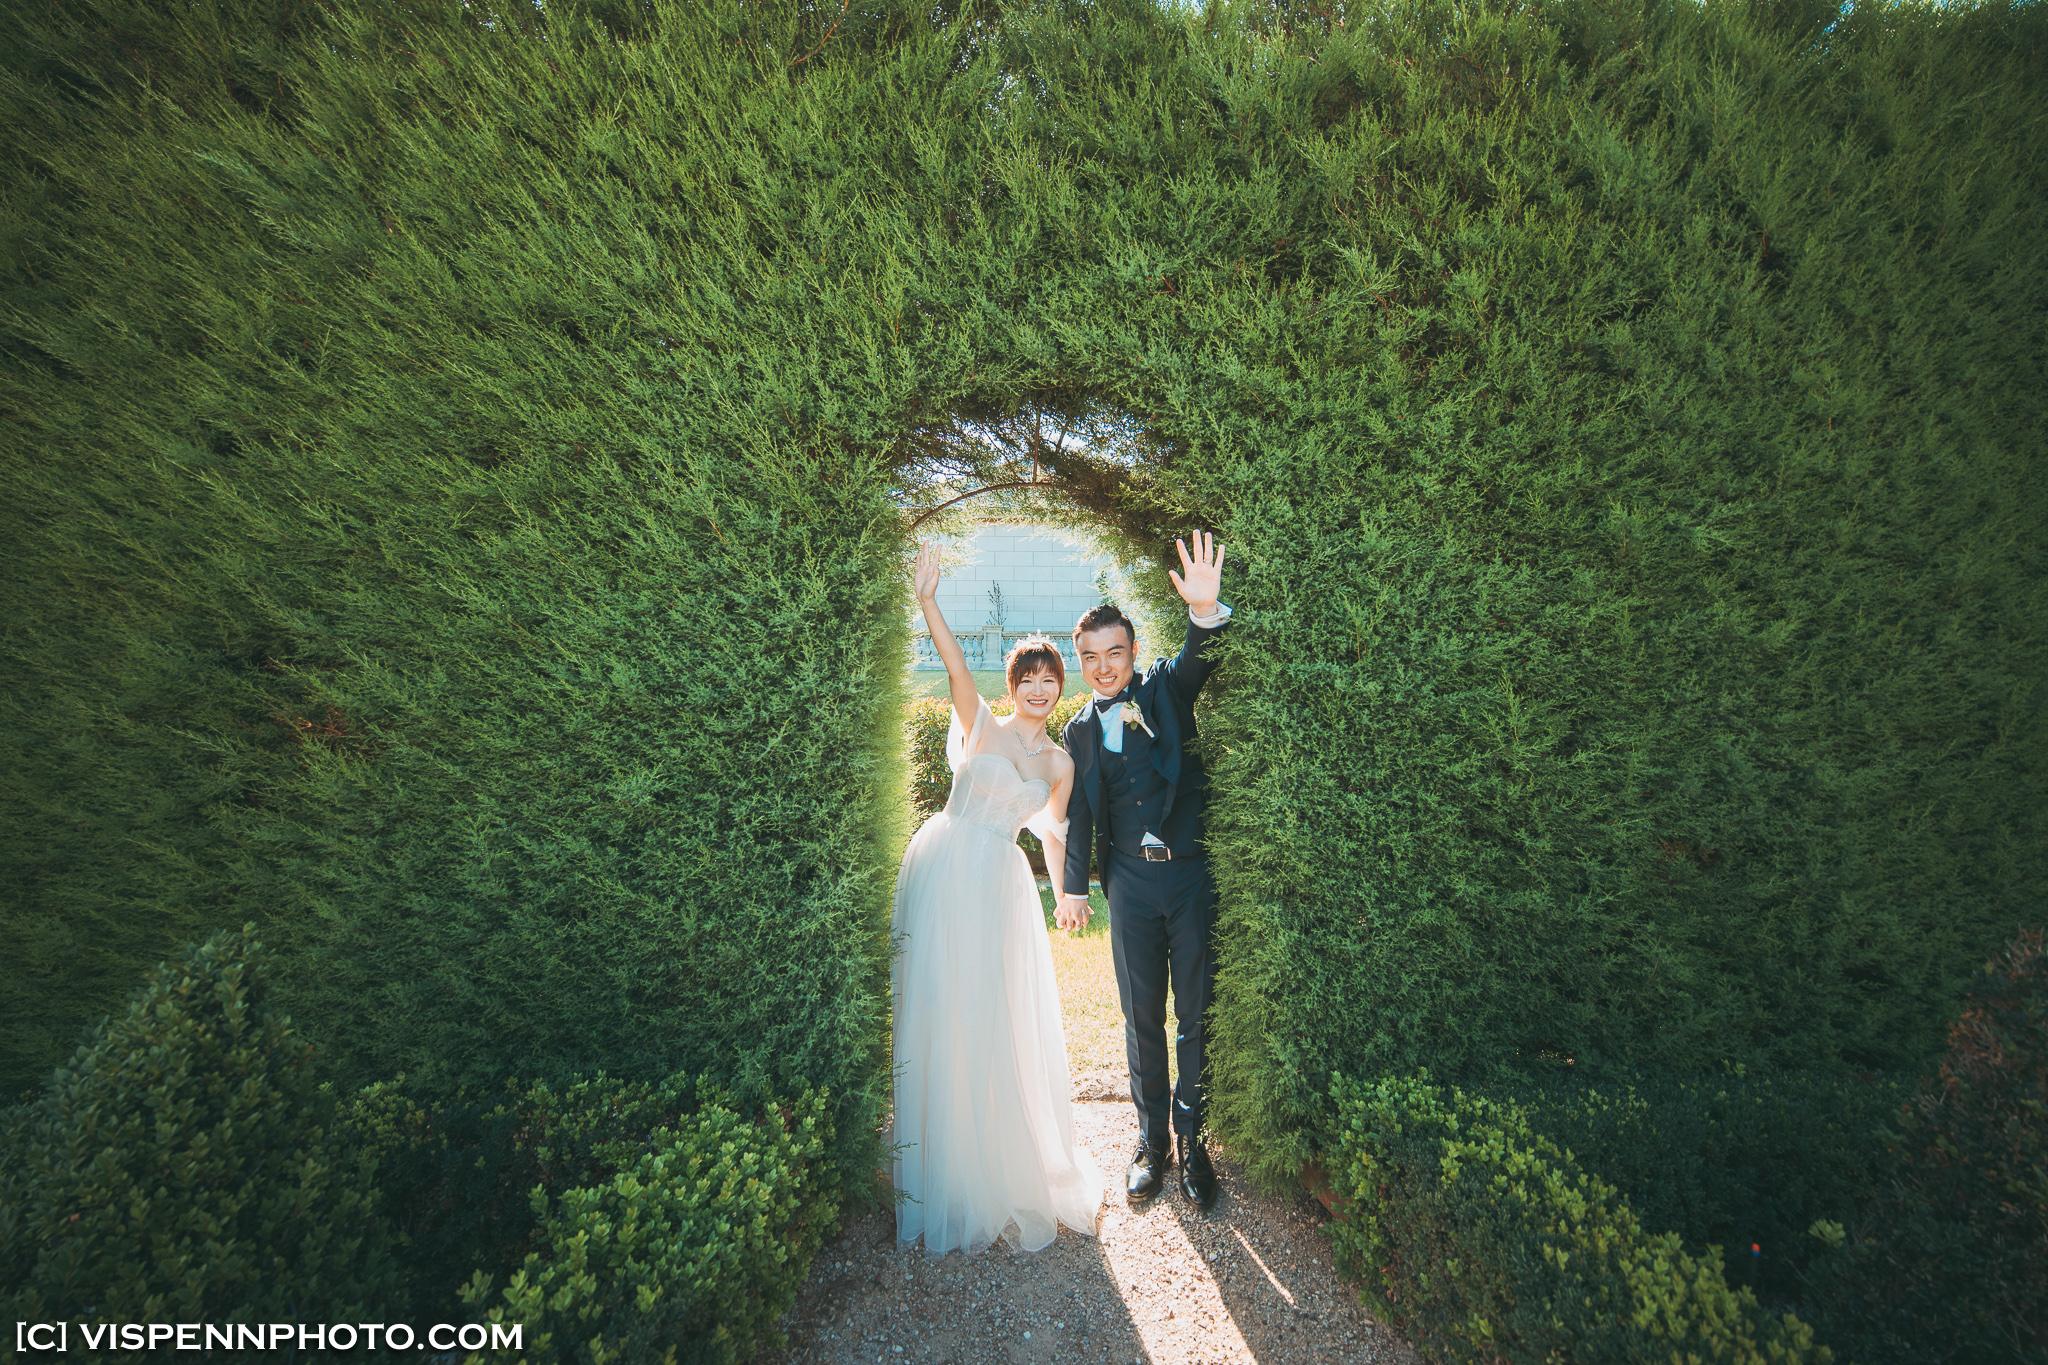 WEDDING DAY Photography Melbourne VISPENN 墨尔本 婚礼跟拍 婚礼摄像 婚礼摄影 结婚照 登记照 5D5 5152